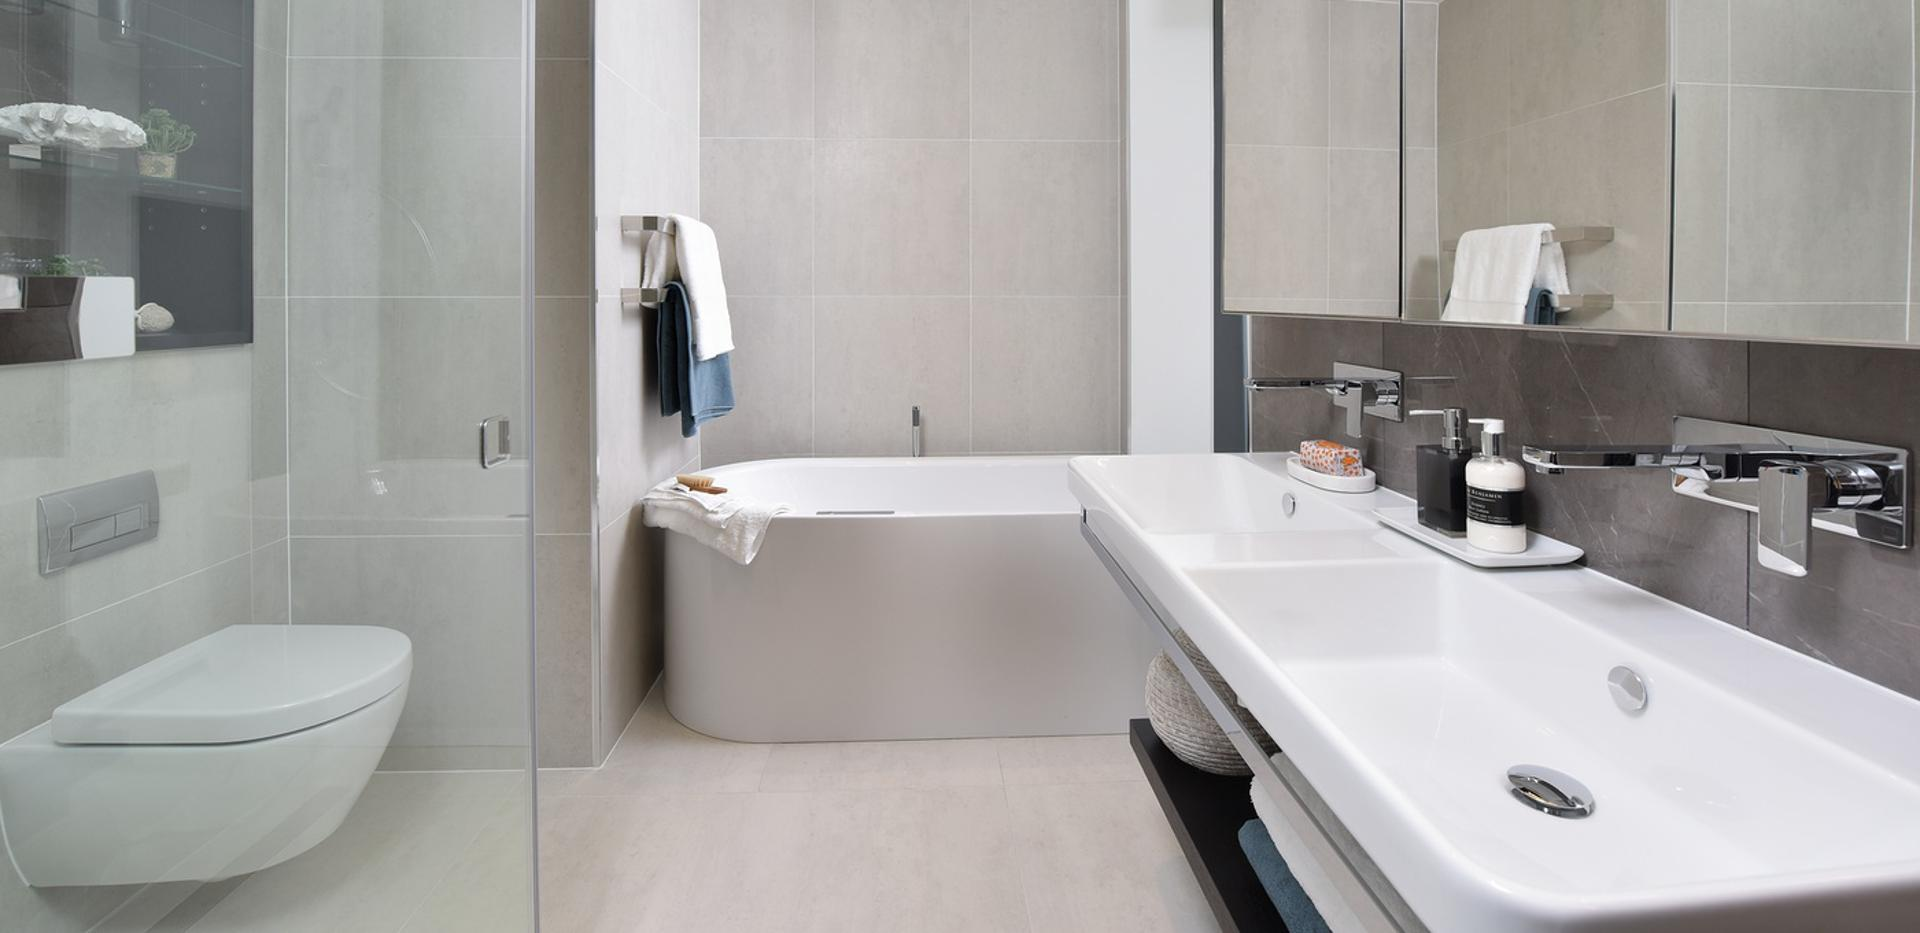 Berkeley, 250 City Road, Islington, Interior, Show Apartment, Bathroom